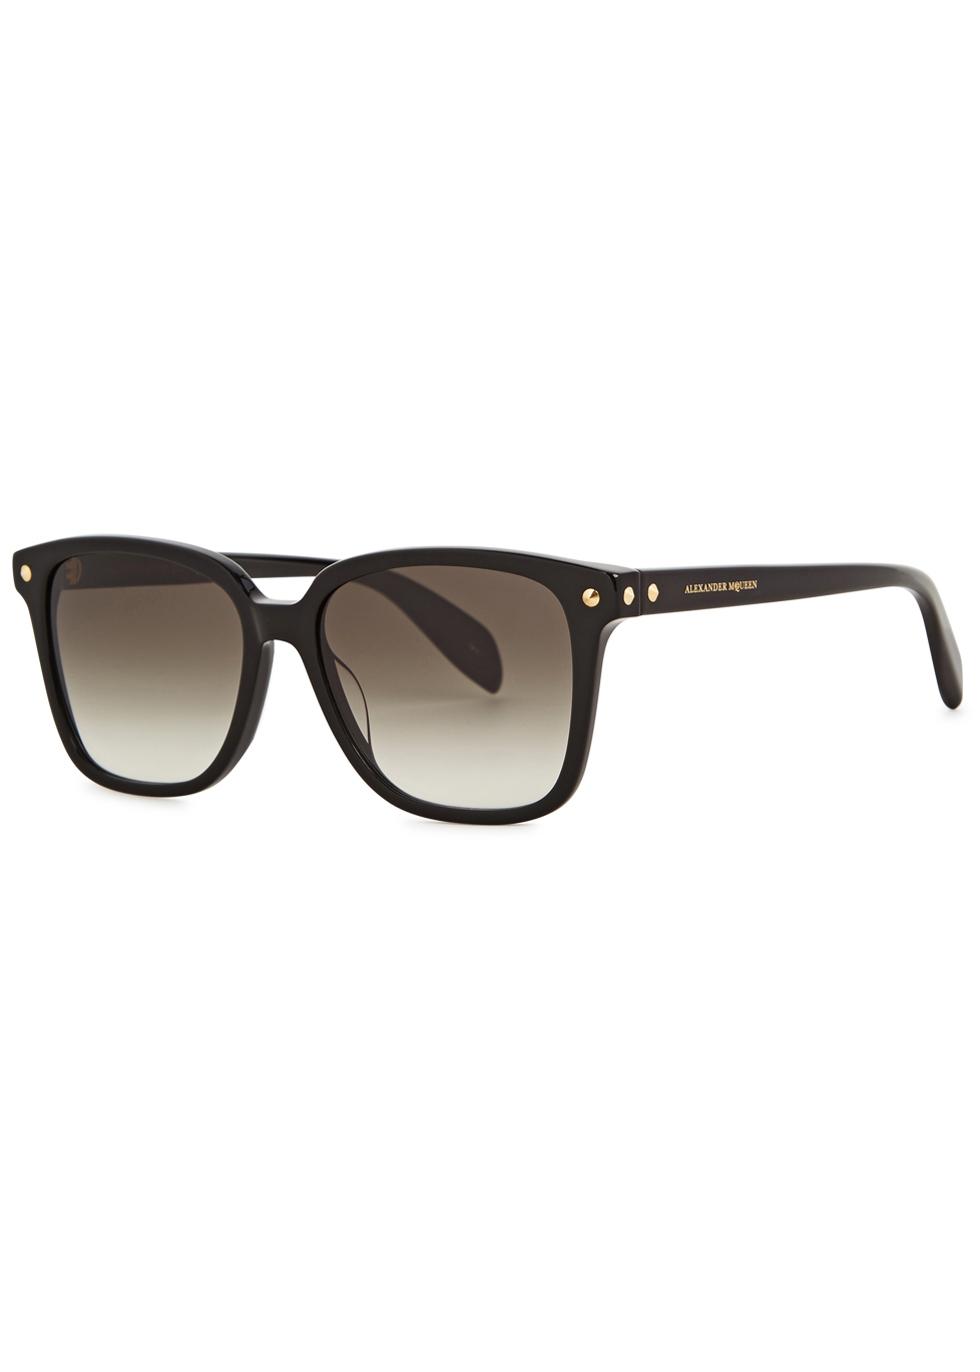 Black wayfarer-style sunglasses - Alexander McQueen